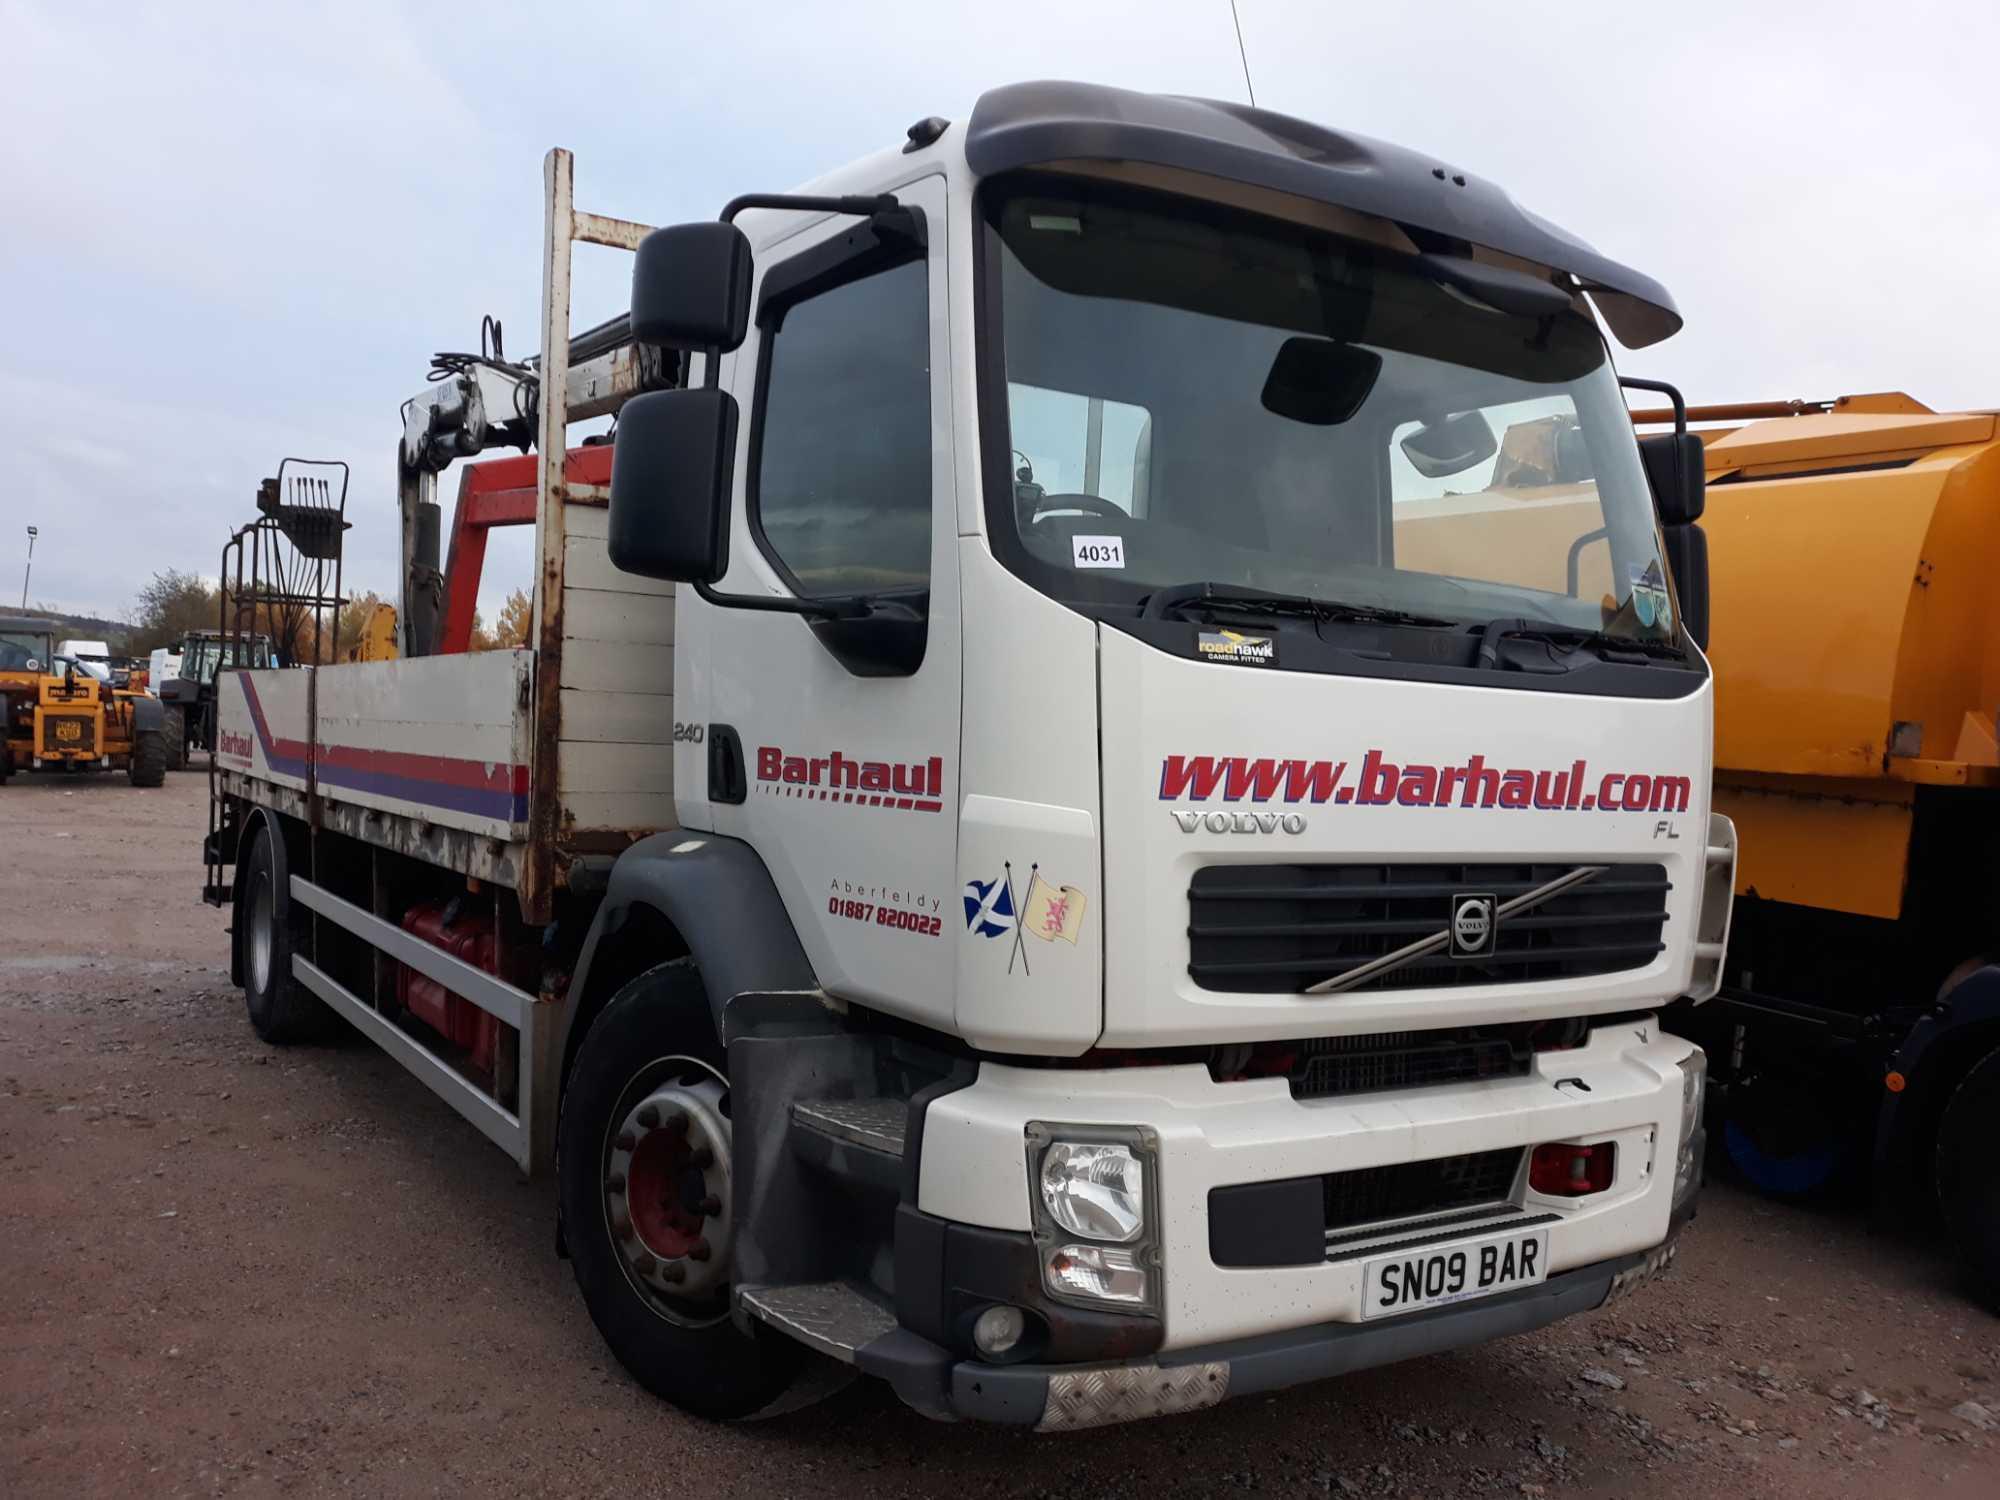 Lot 4031 - Volvo Fl Flh 4x2 L1h1 Day E4 - 7146cc 2 Door Truck